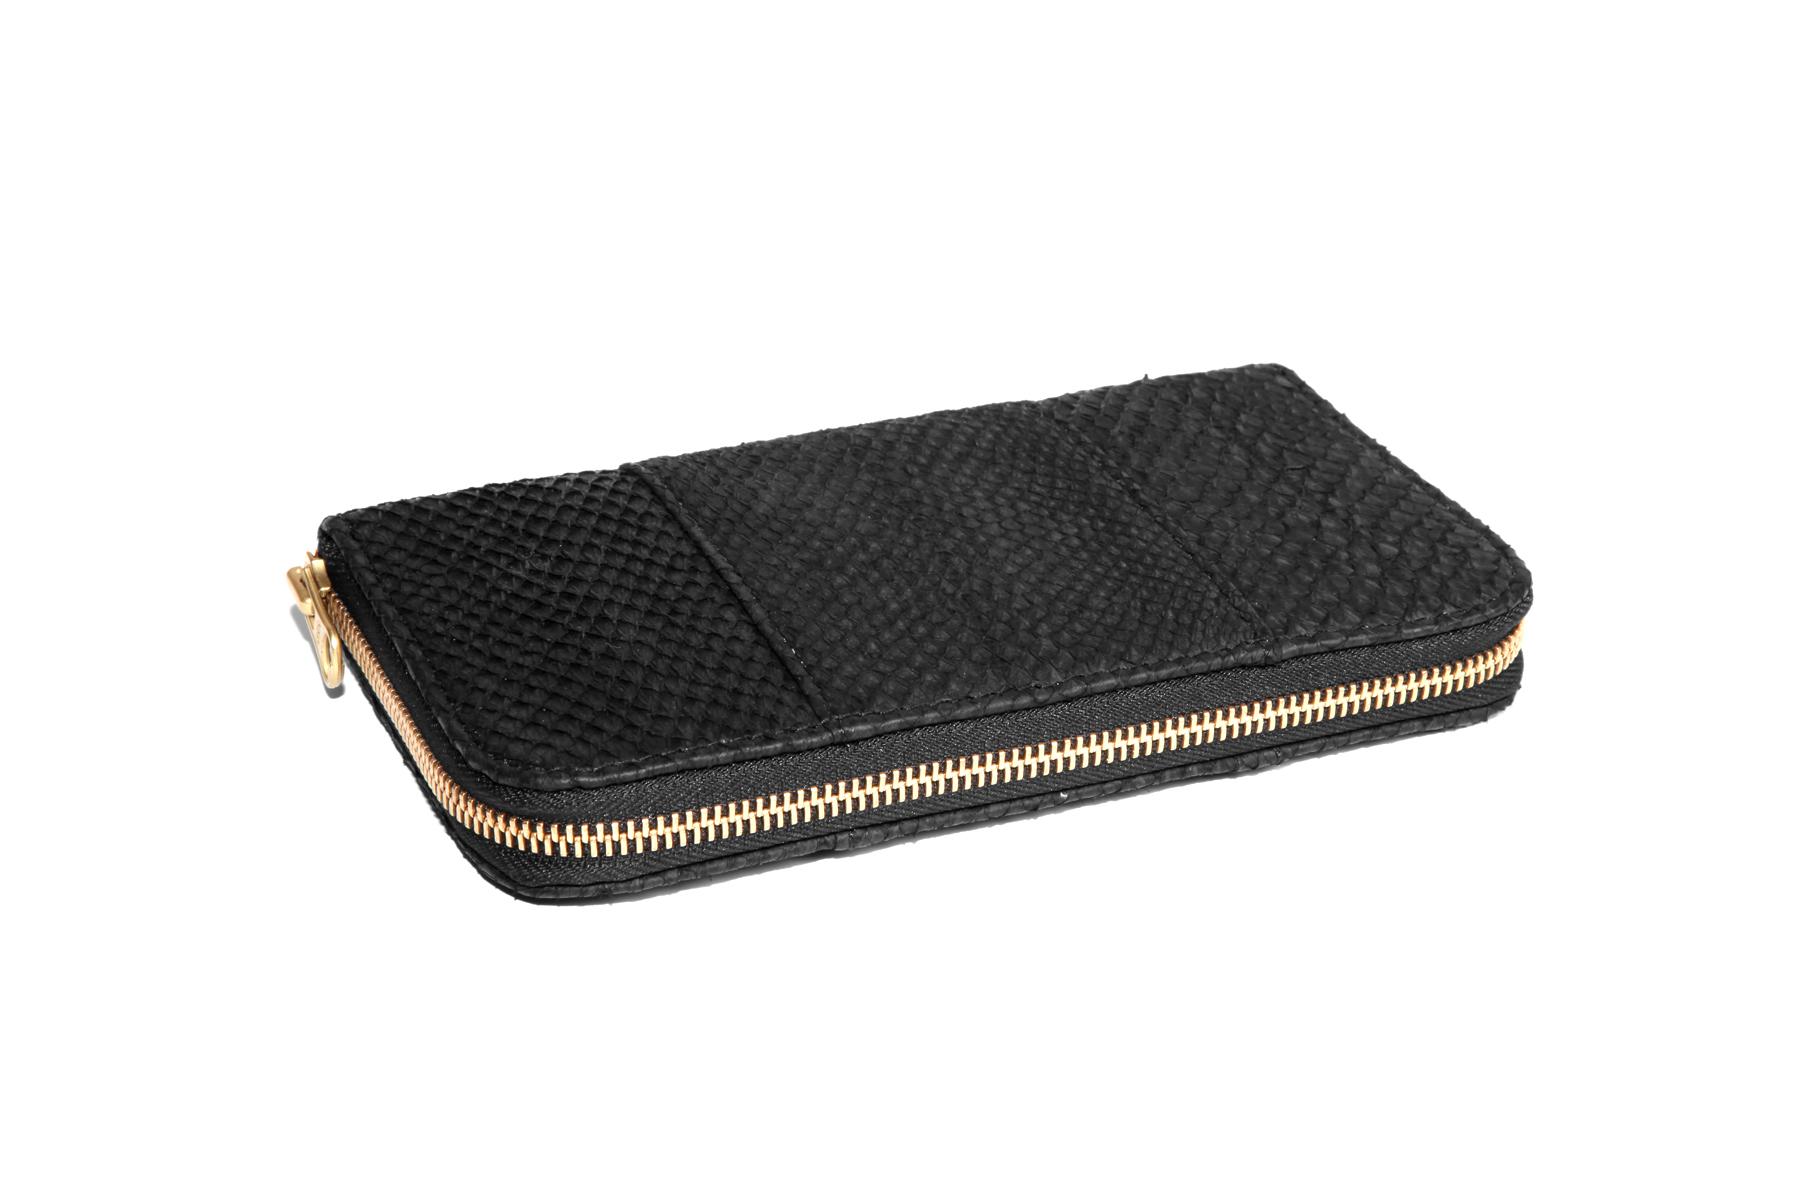 Mahiout PLC wallet in salon skin